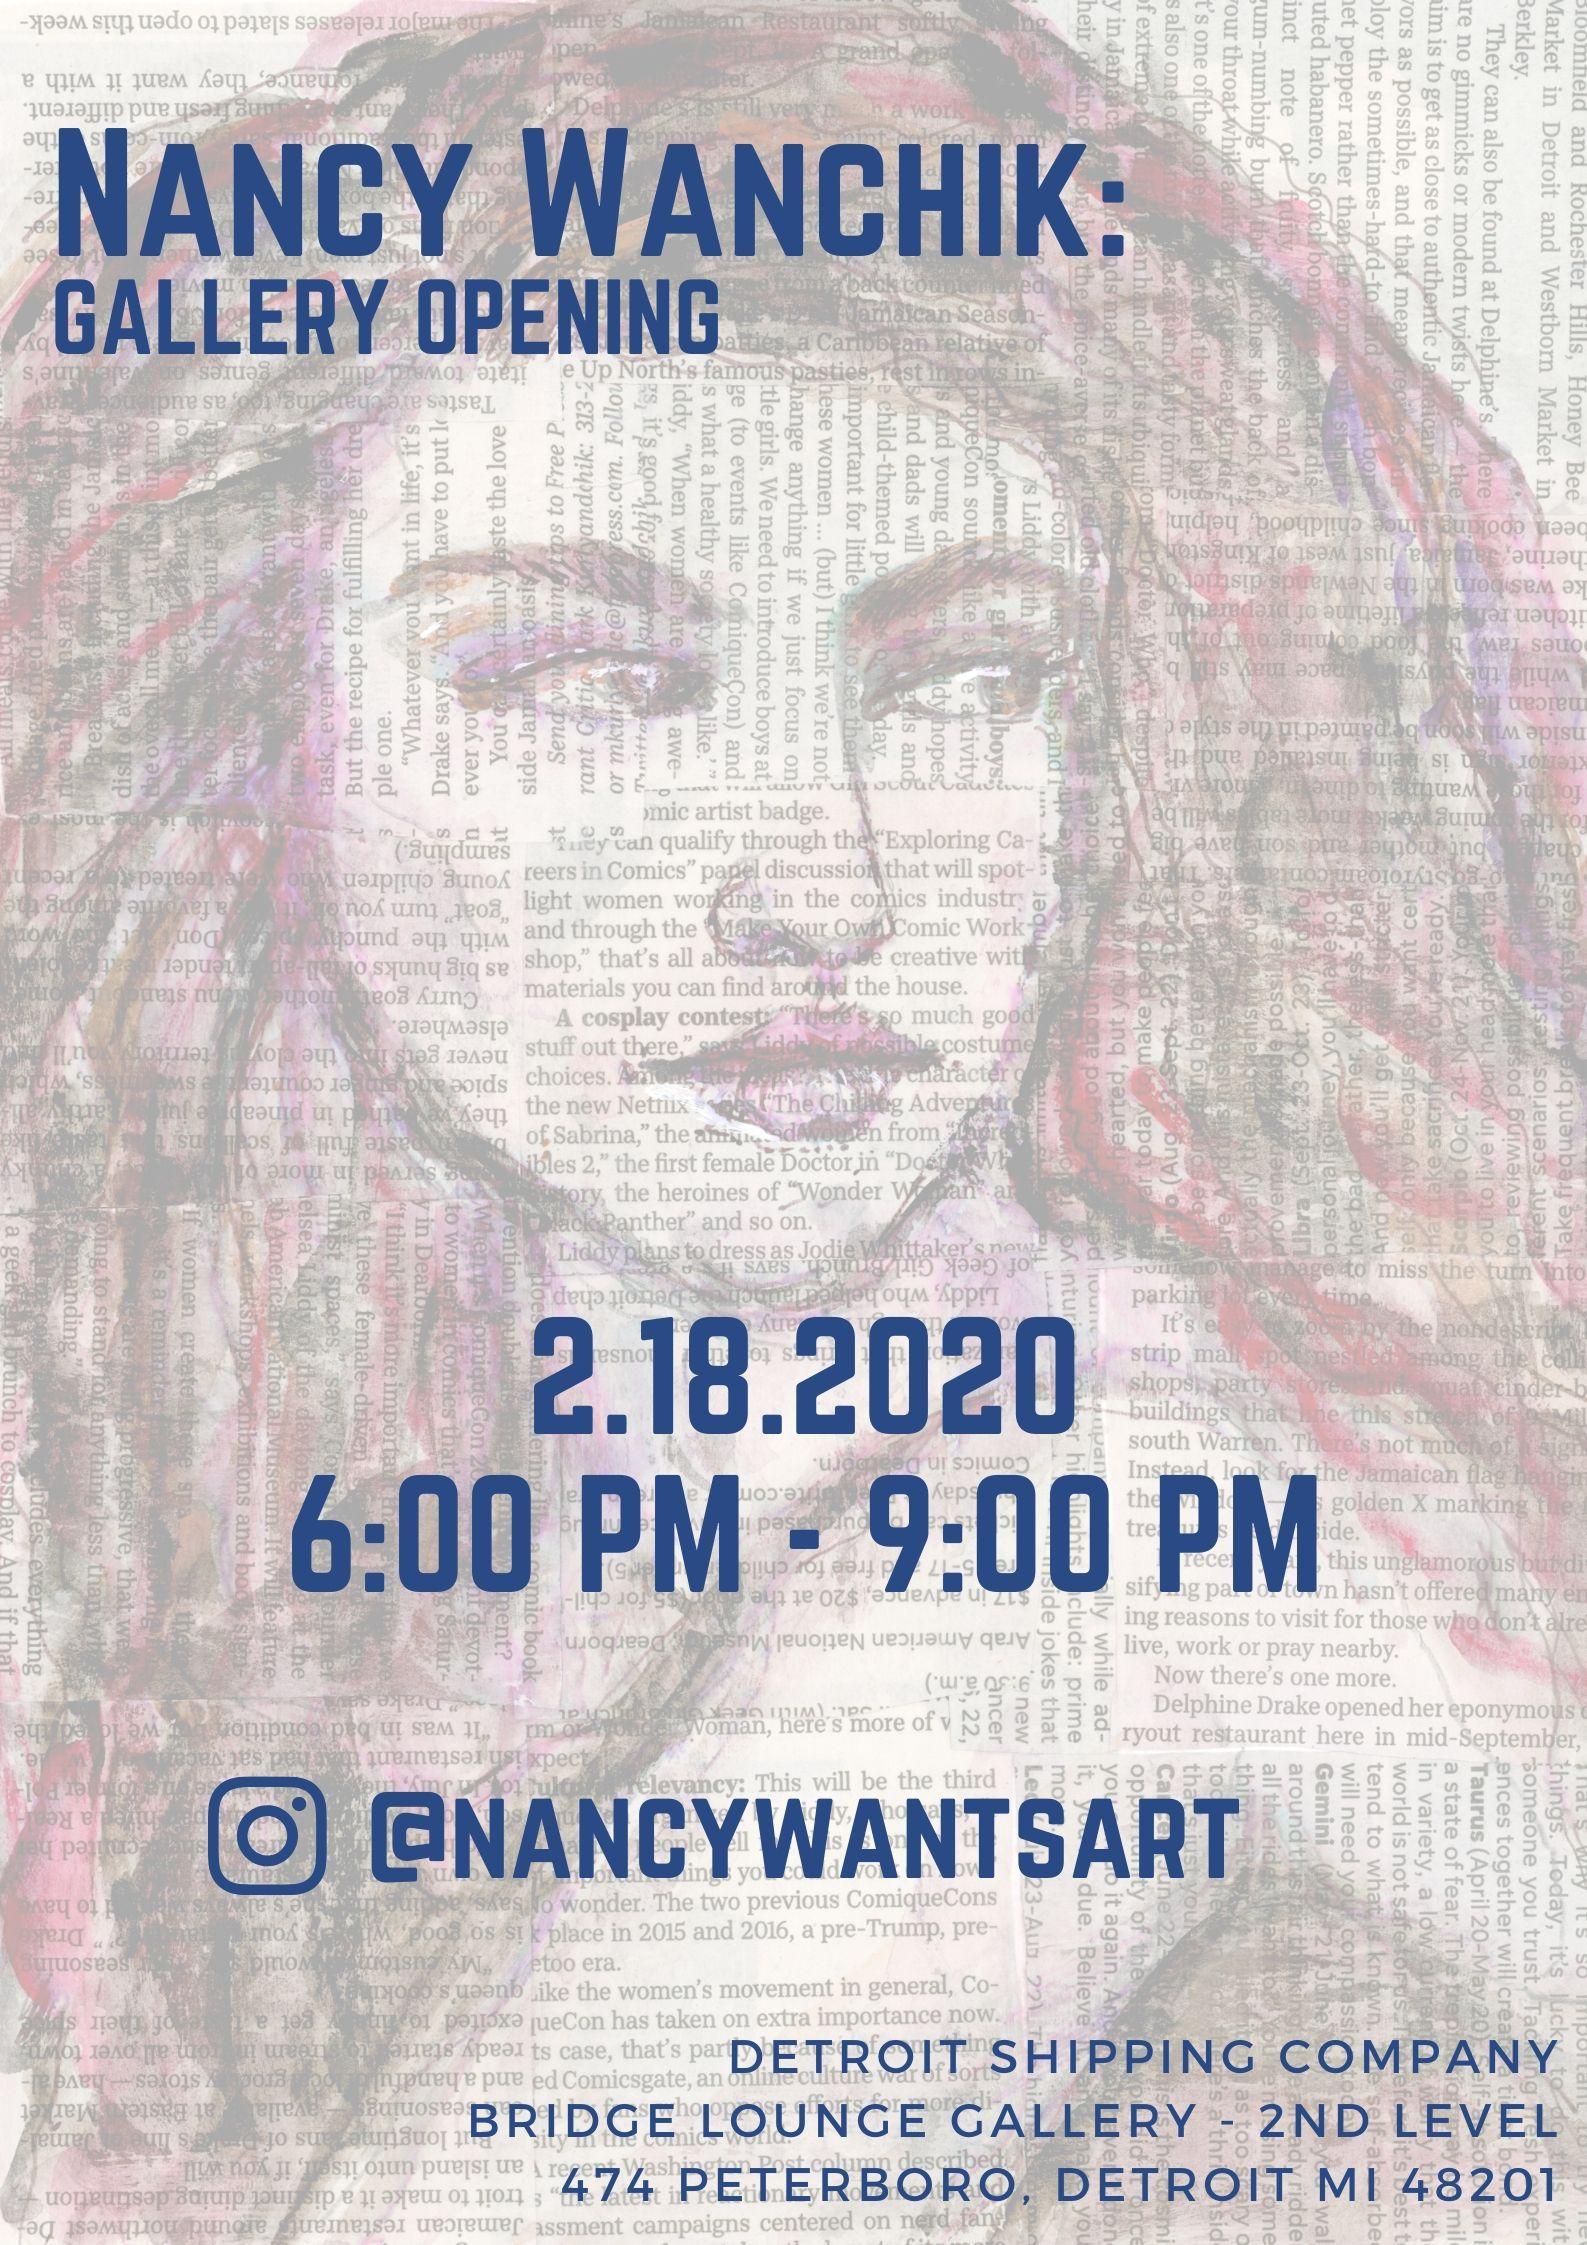 Bridge Gallery Opening: Nancy Wanchik